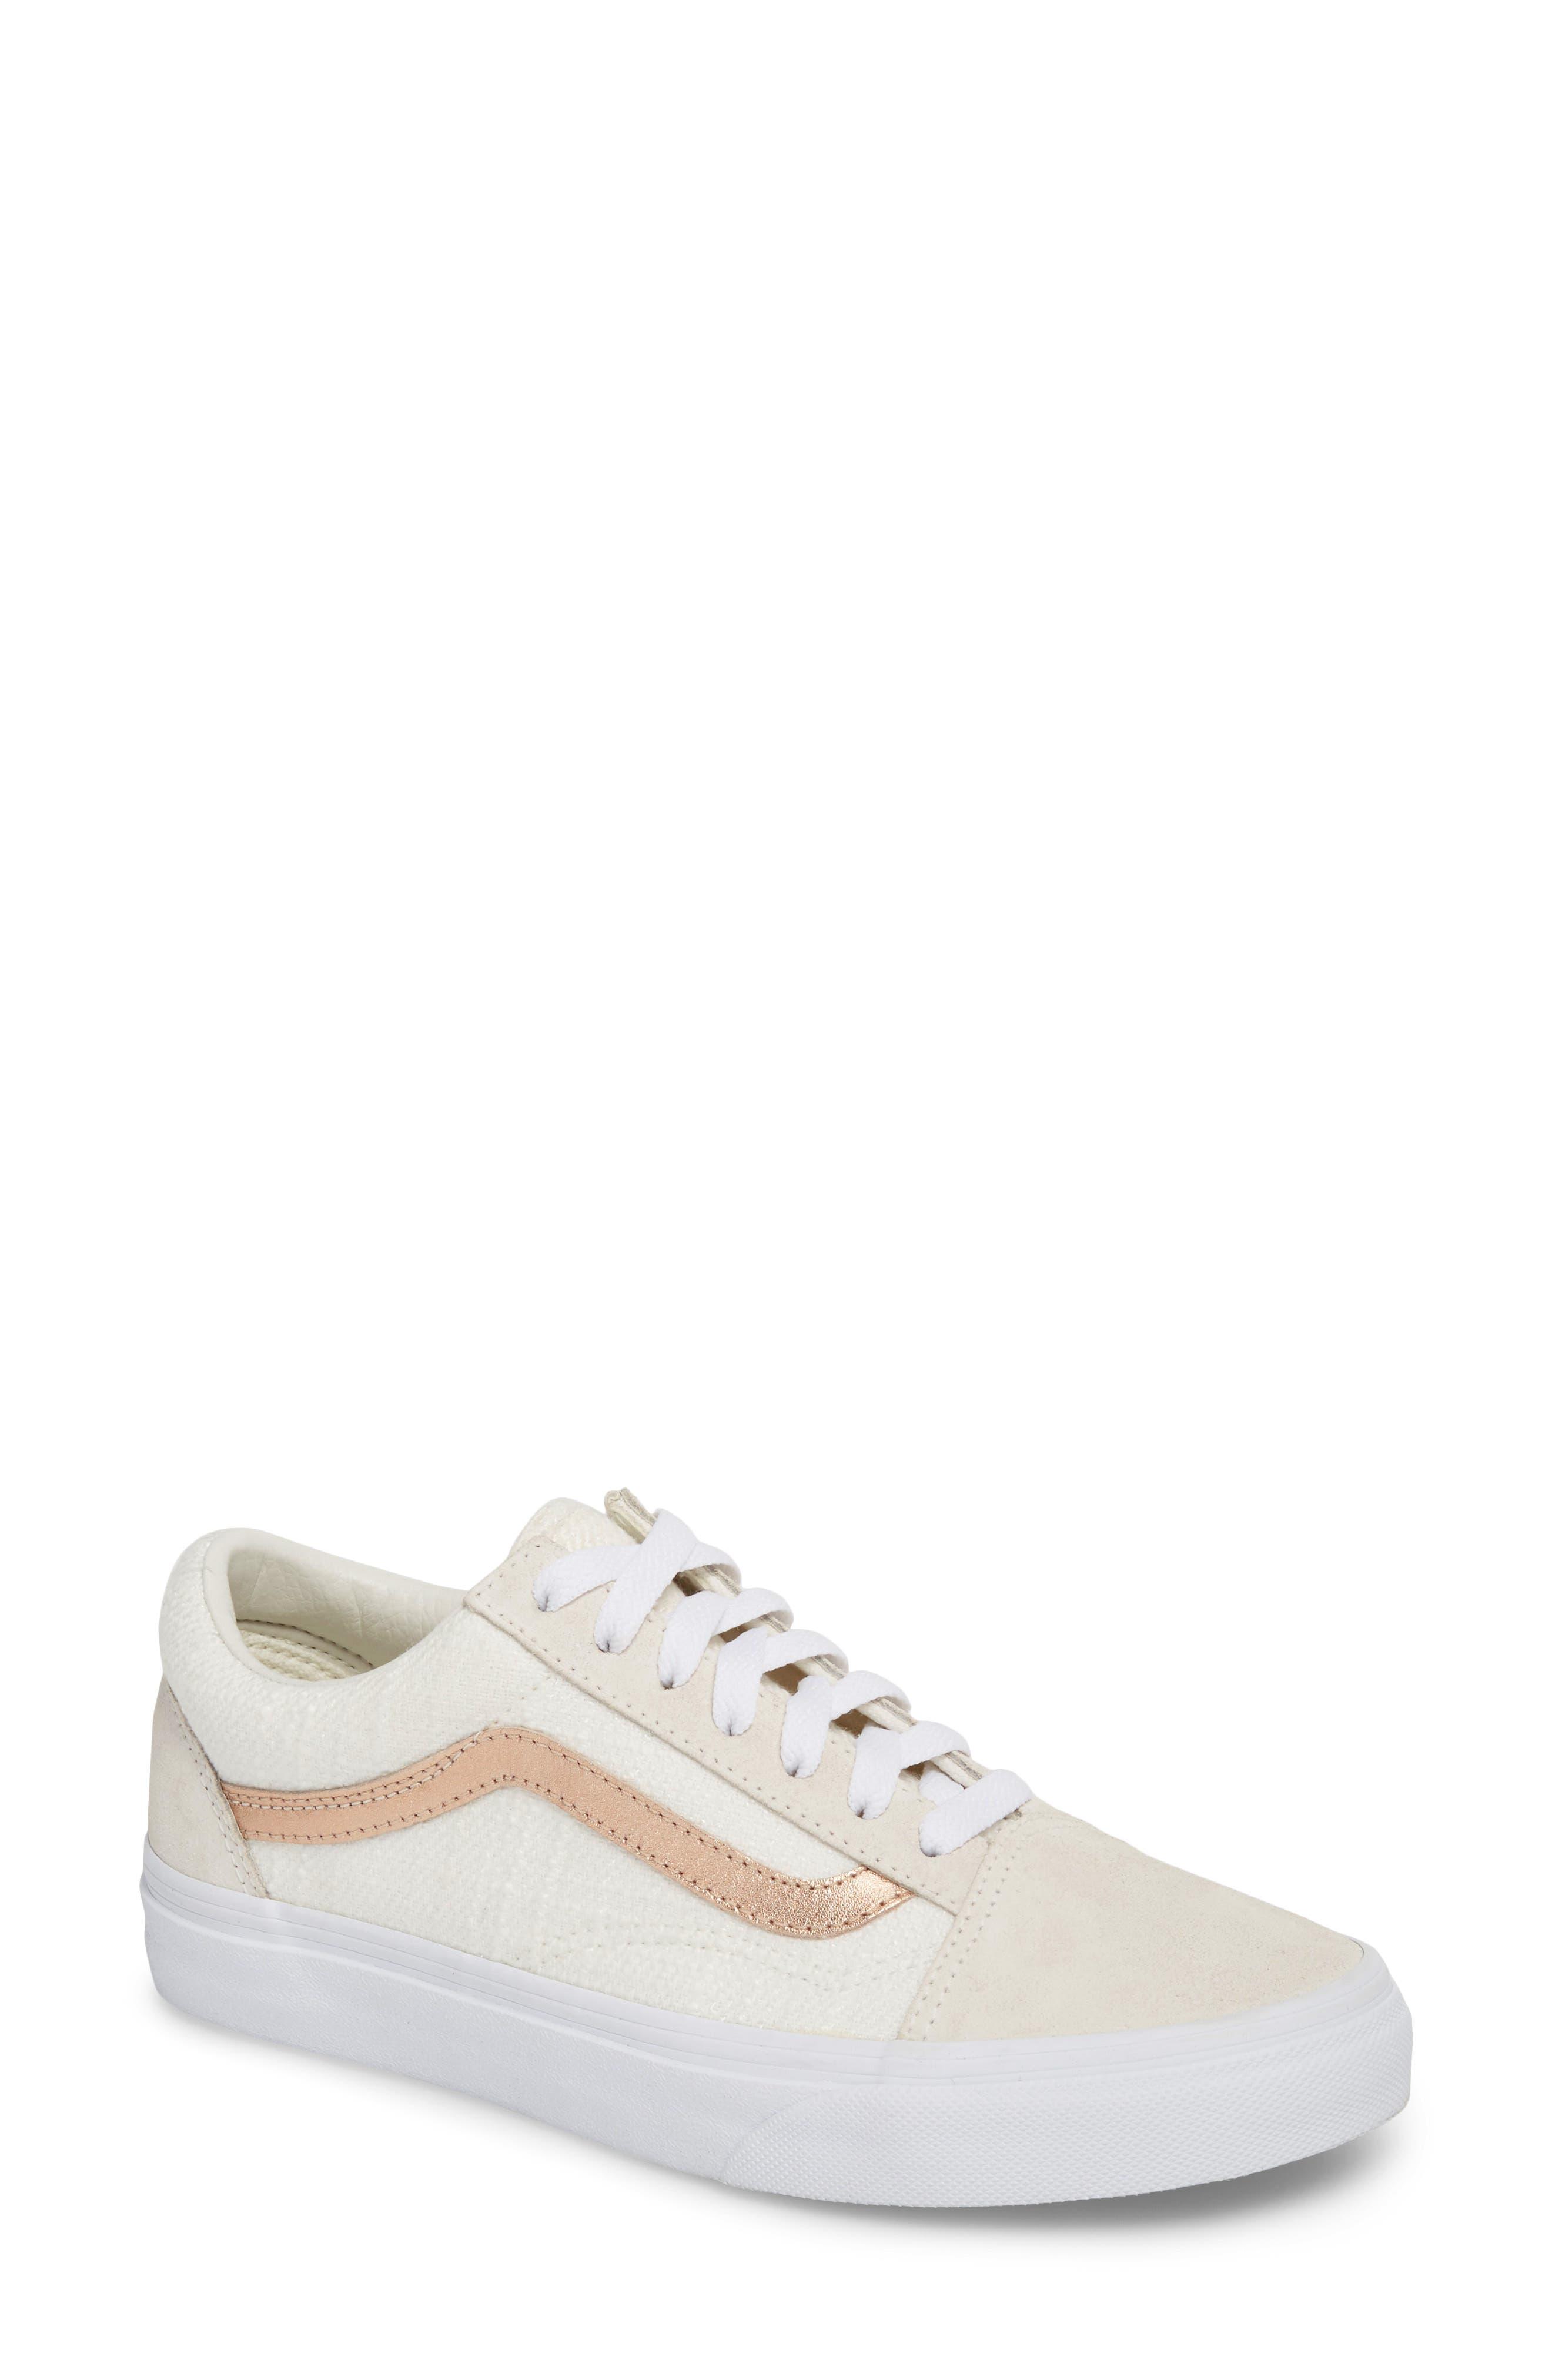 Old Skool Sneaker,                         Main,                         color, Blanc De Blanc/ Rose Gold